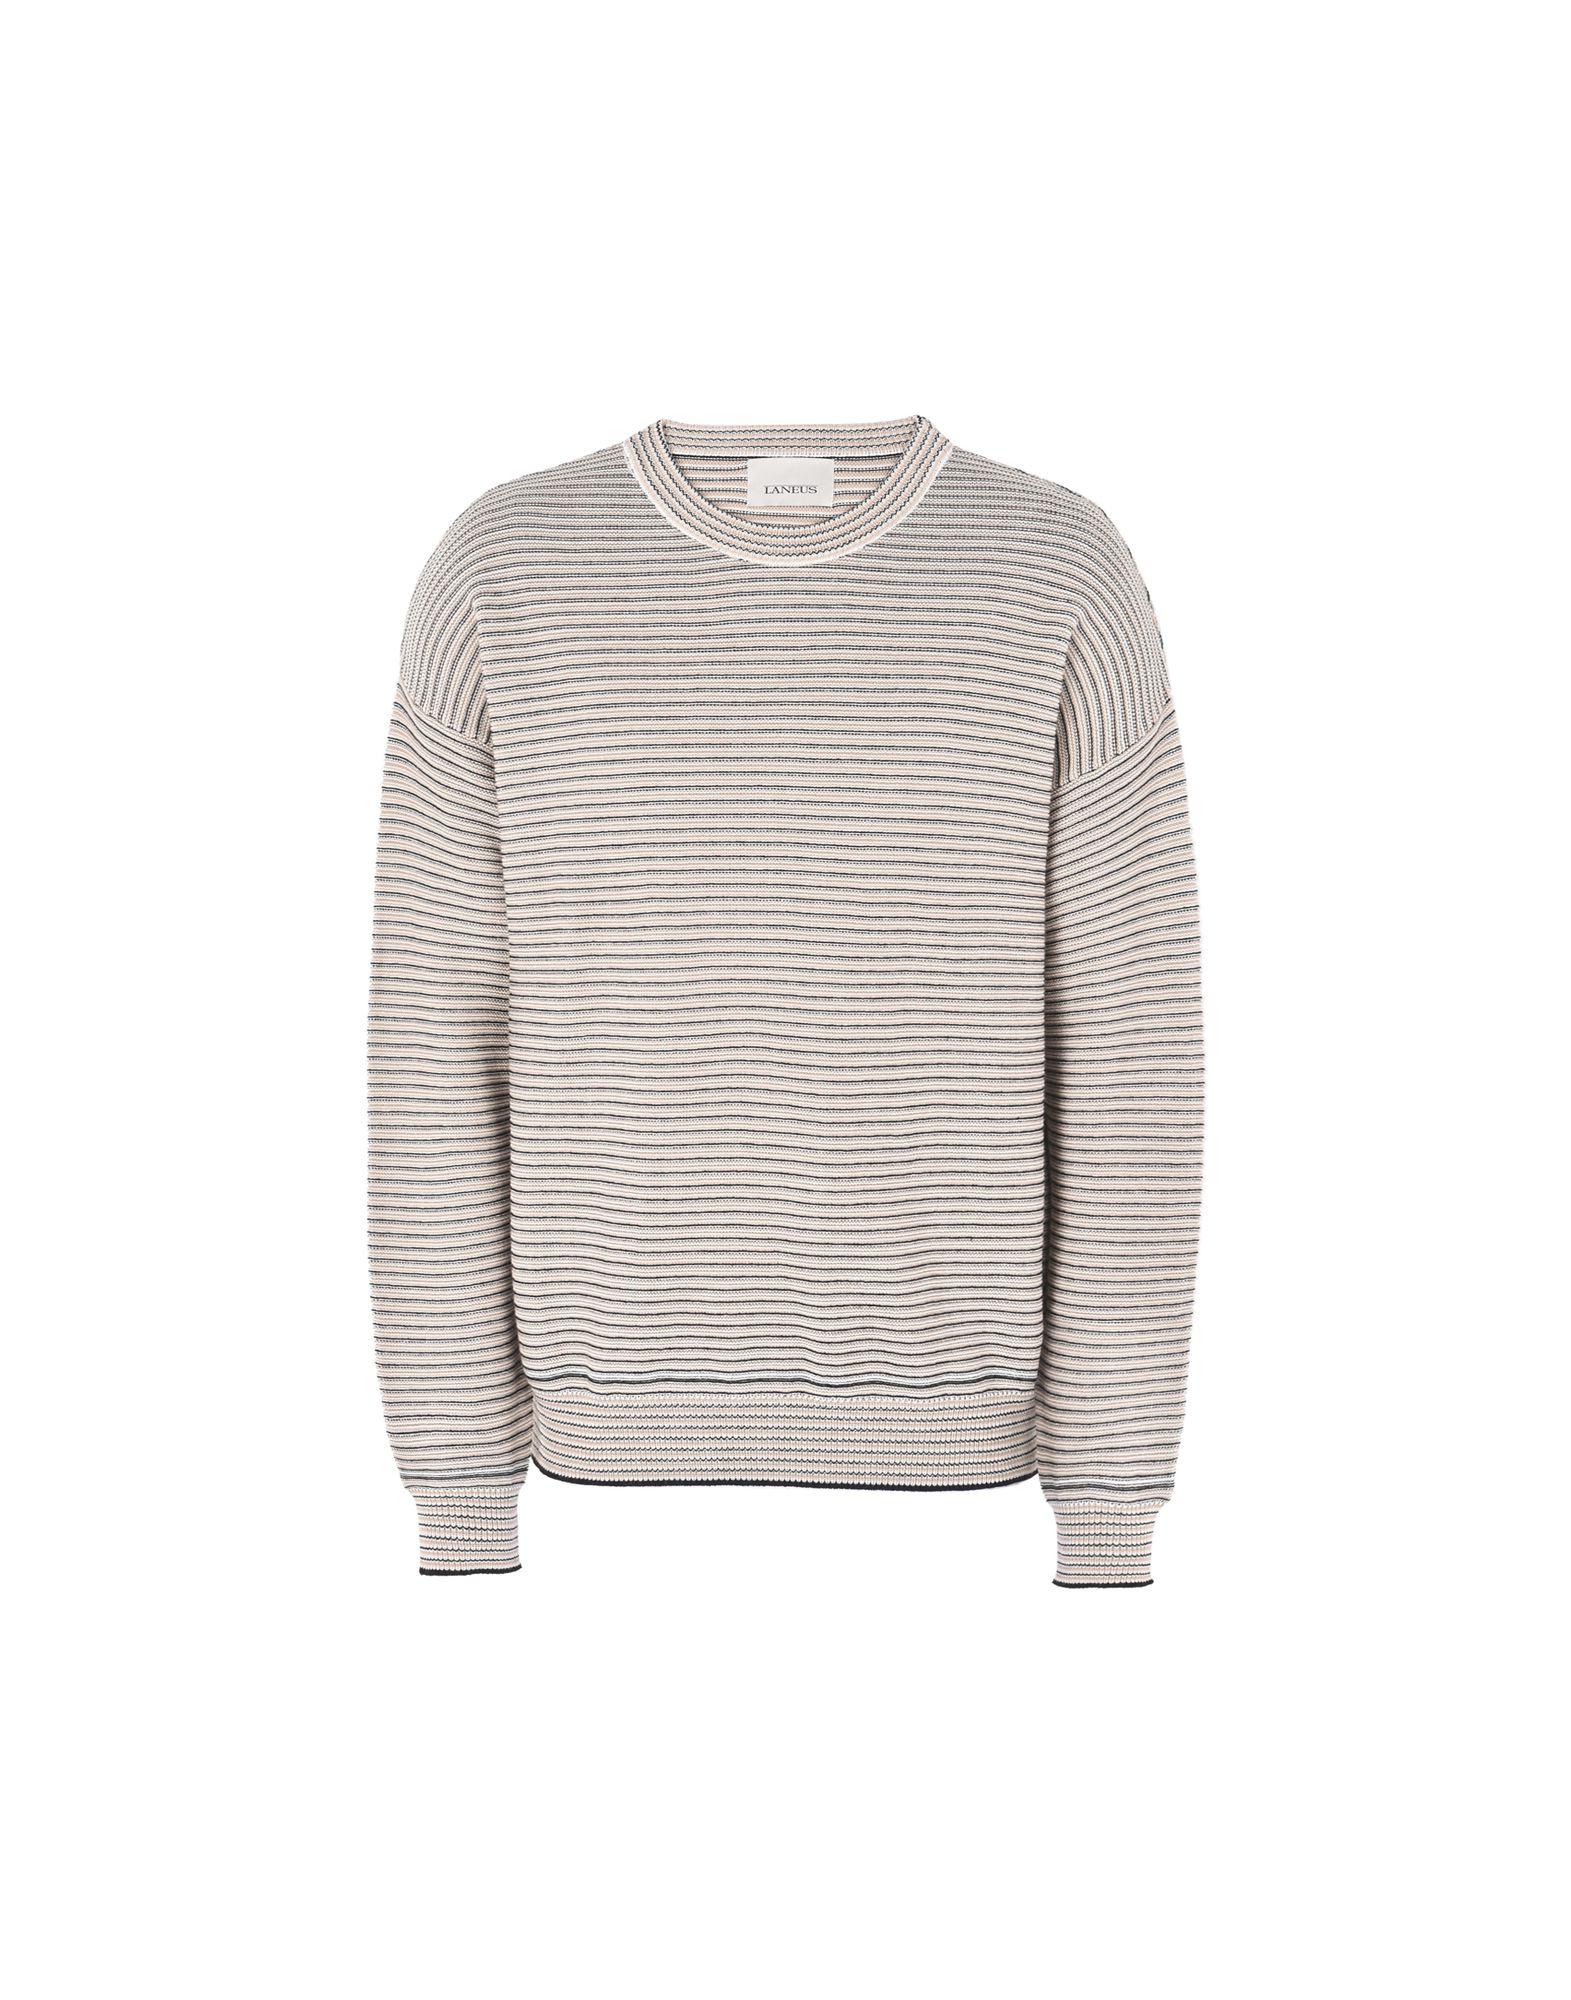 Pullover Laneus Girocollo Millerighe - Uomo - Acquista online su